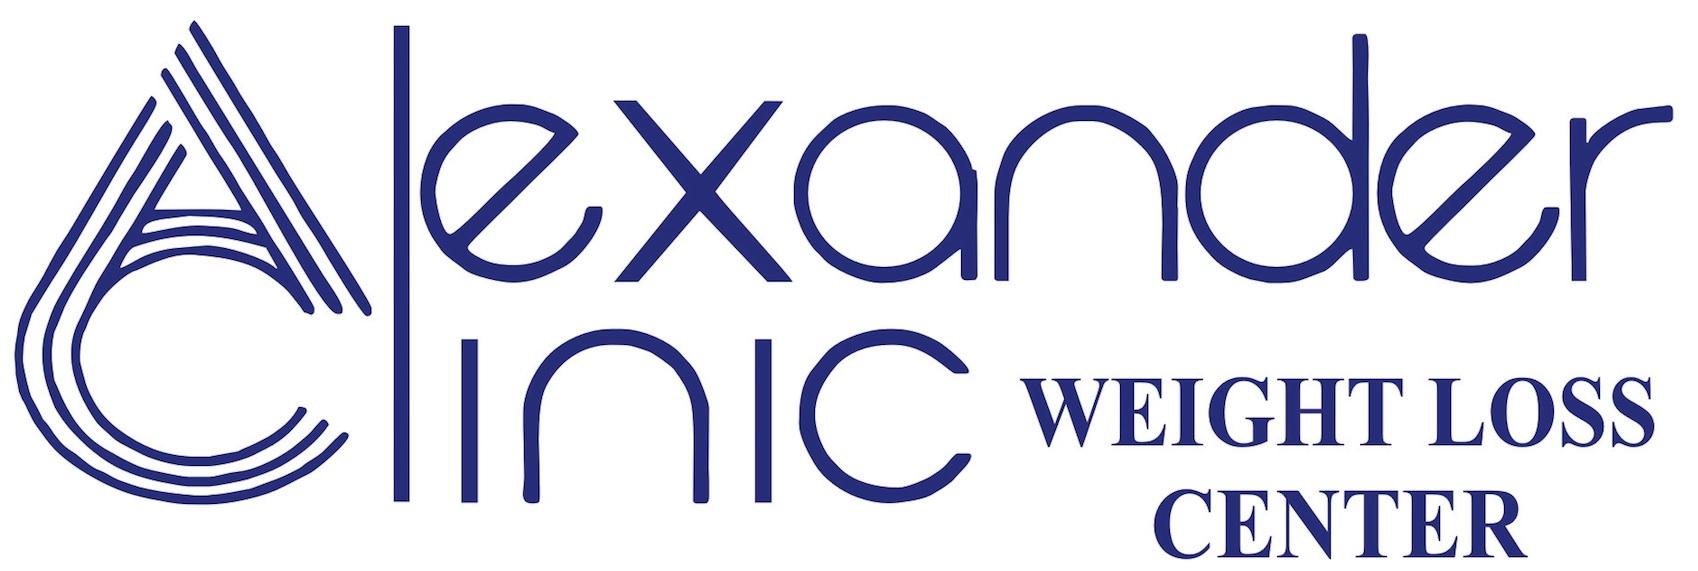 Alexander Clinic - Abilene, TX 79601 - (325)672-7772 | ShowMeLocal.com